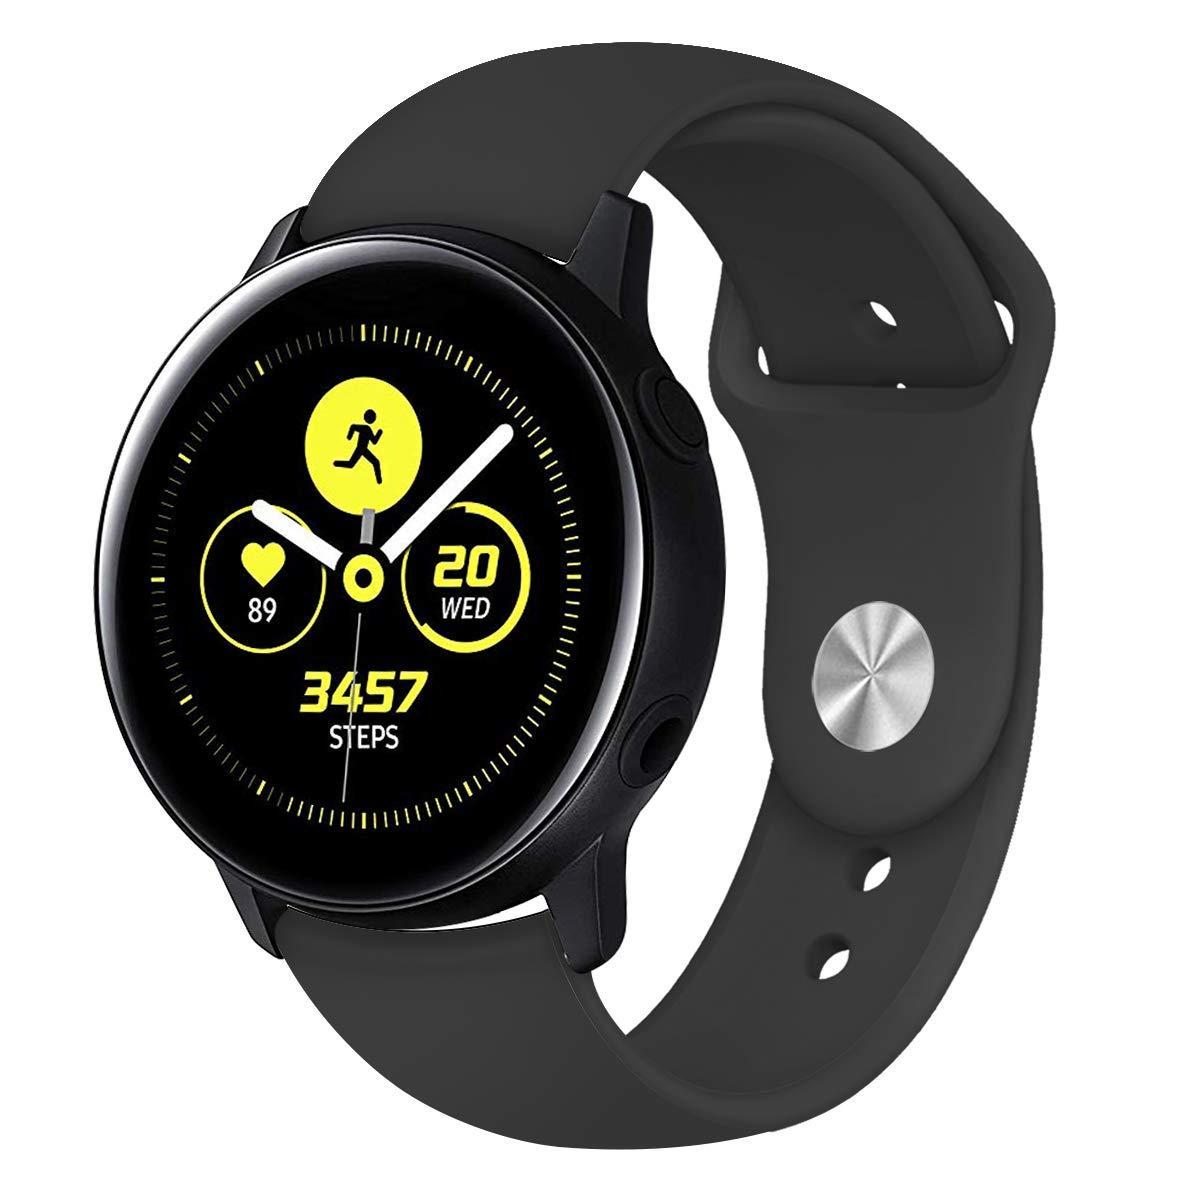 Ремінець BeWatch для Samsung Galaxy watch Active Чорний (1010301)